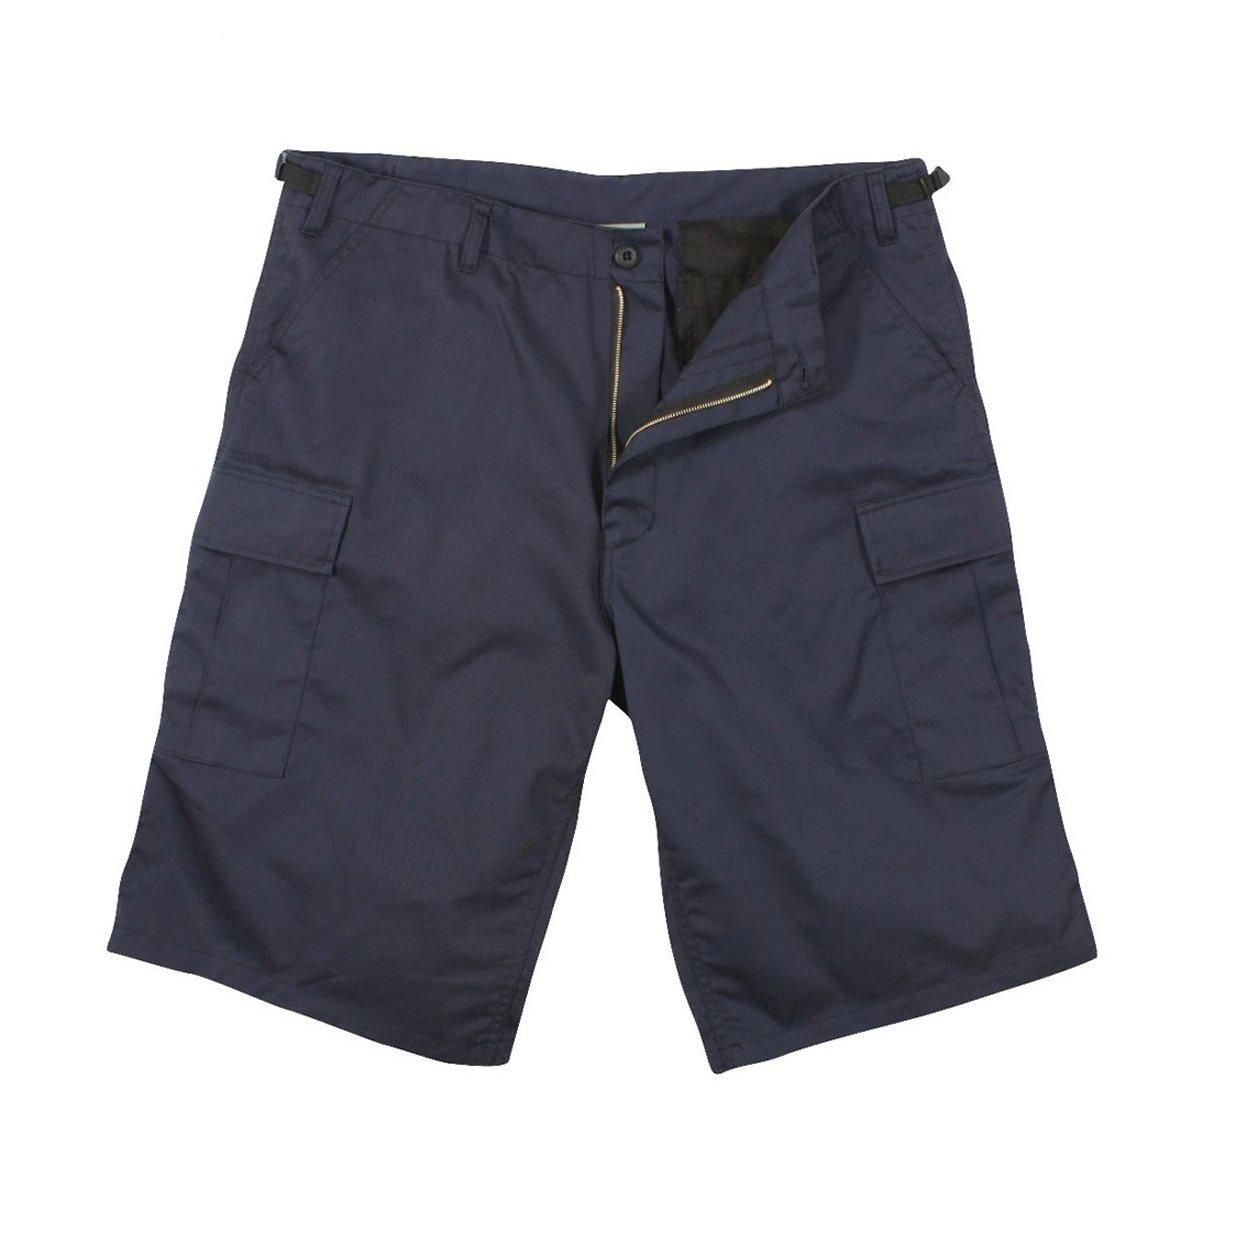 Short Pants BDU ULTRA FORCE LONGER YOU. BLUE ROTHCO 7432 L-11